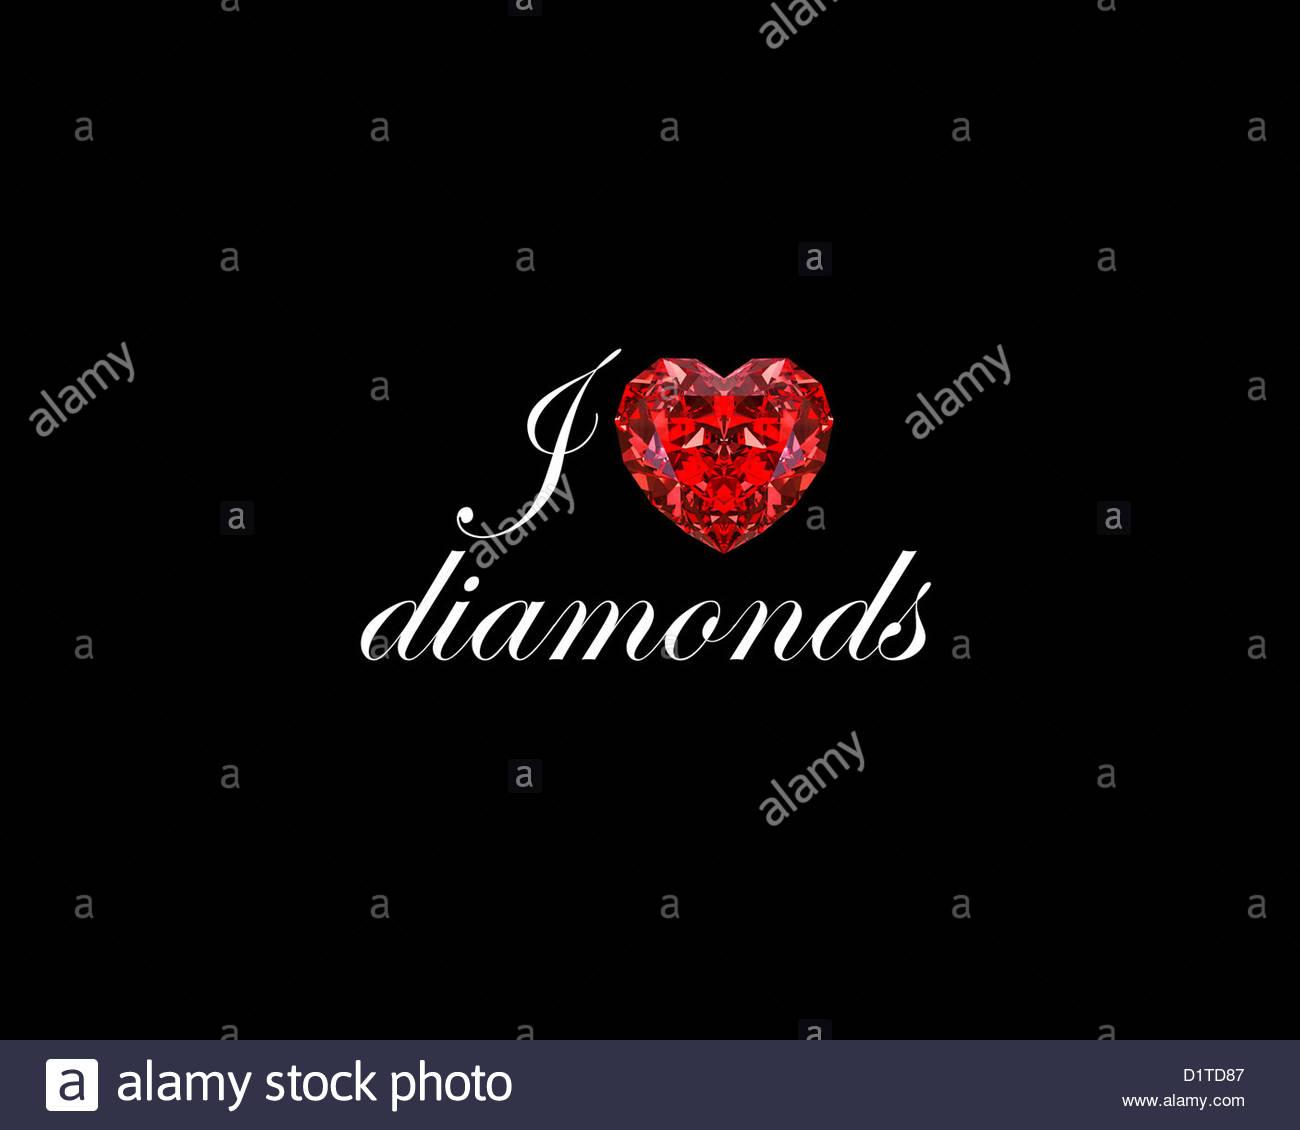 wallpaper with I LOVE DIAMONDS Red diamond heart Stock Photo 1300x1130